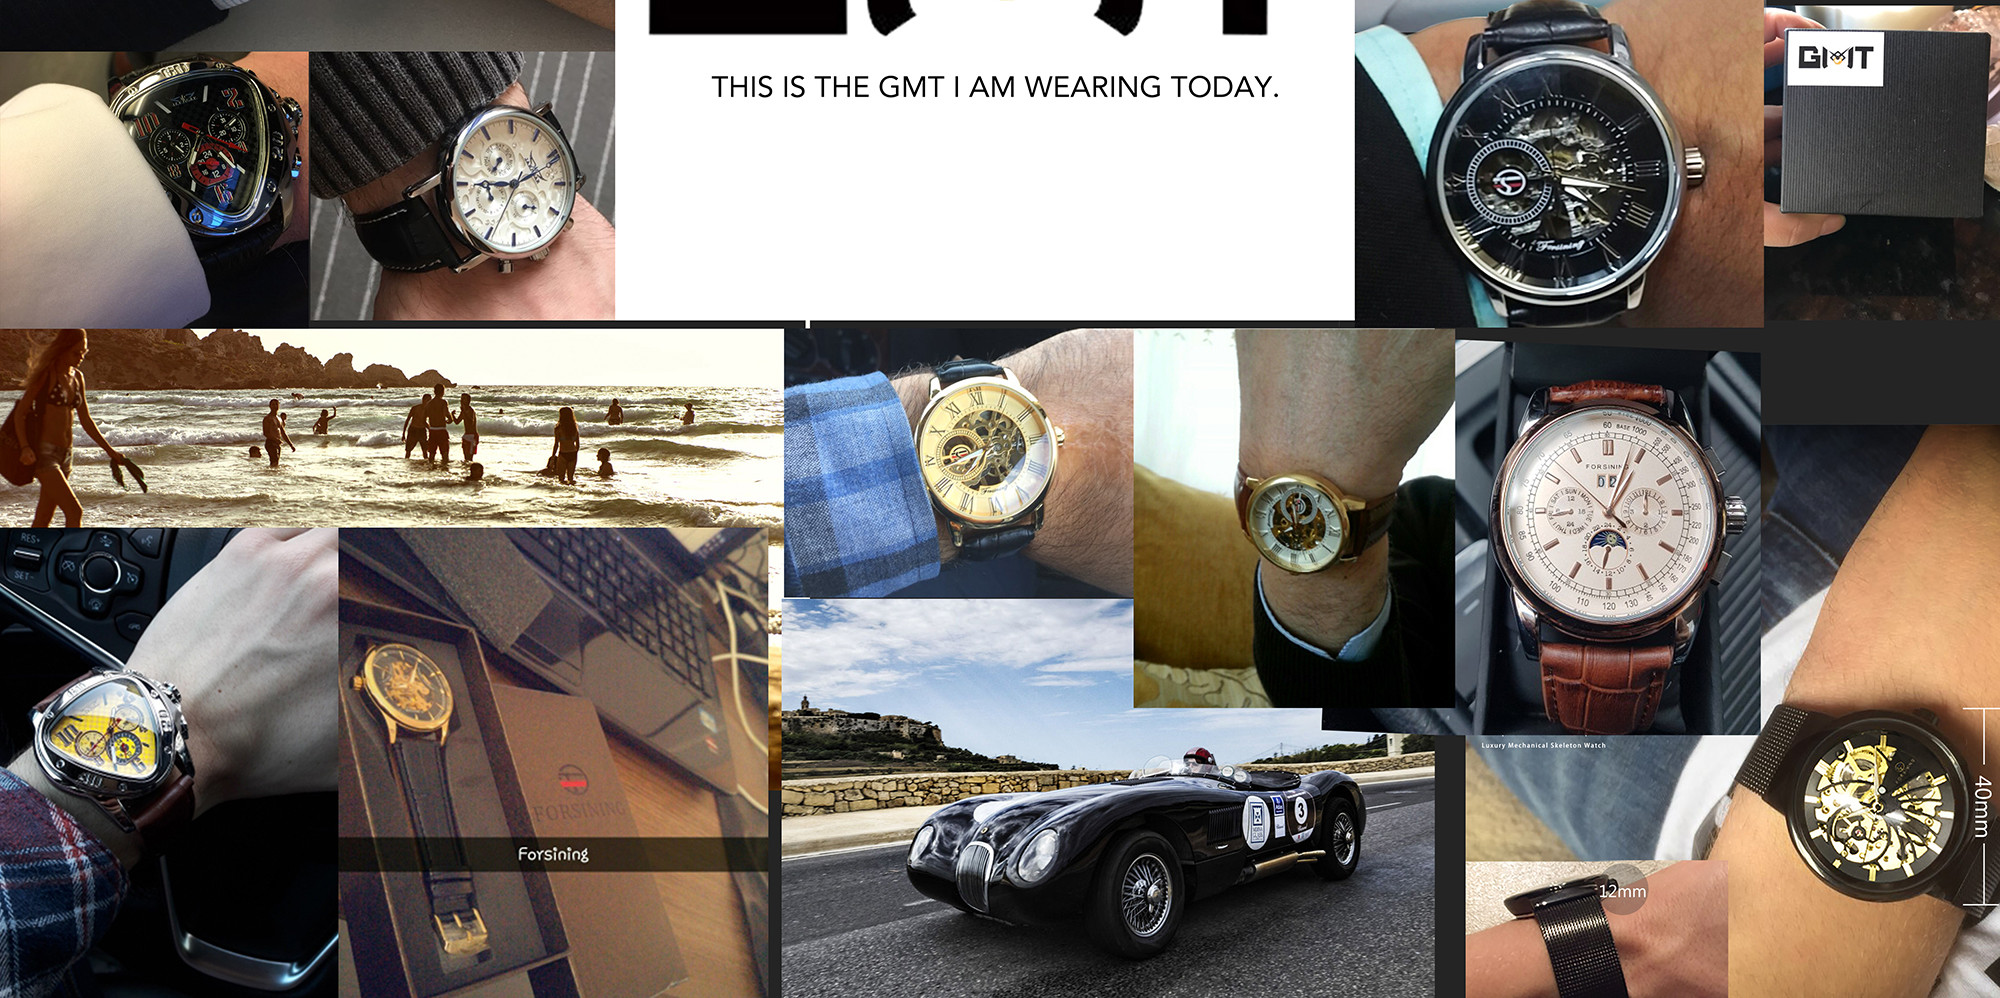 HTB1MnMDdzihSKJjy0Feq6zJtpXaT Winner Golden Watches Classic Rhinestone Clock Roman Analog Male Skeleton Clocks Automatic Mechanical Stainless Steel Band Watch